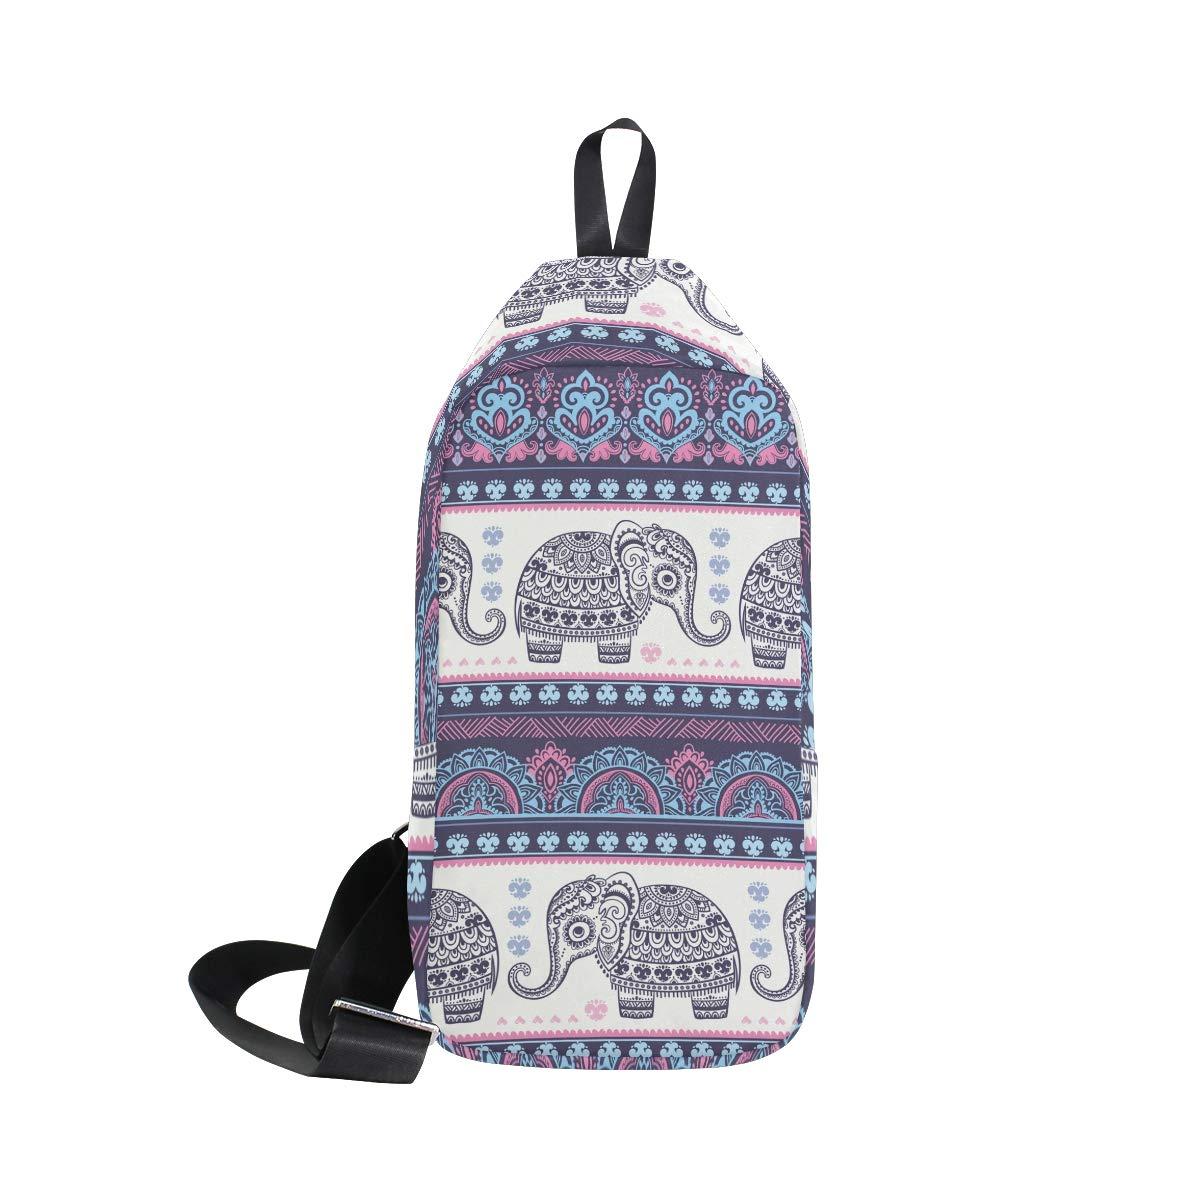 GymSack Drawstring Bag Sackpack Meteorite Collision Sport Cinch Pack Simple Bundle Pocke Backpack For Men Women